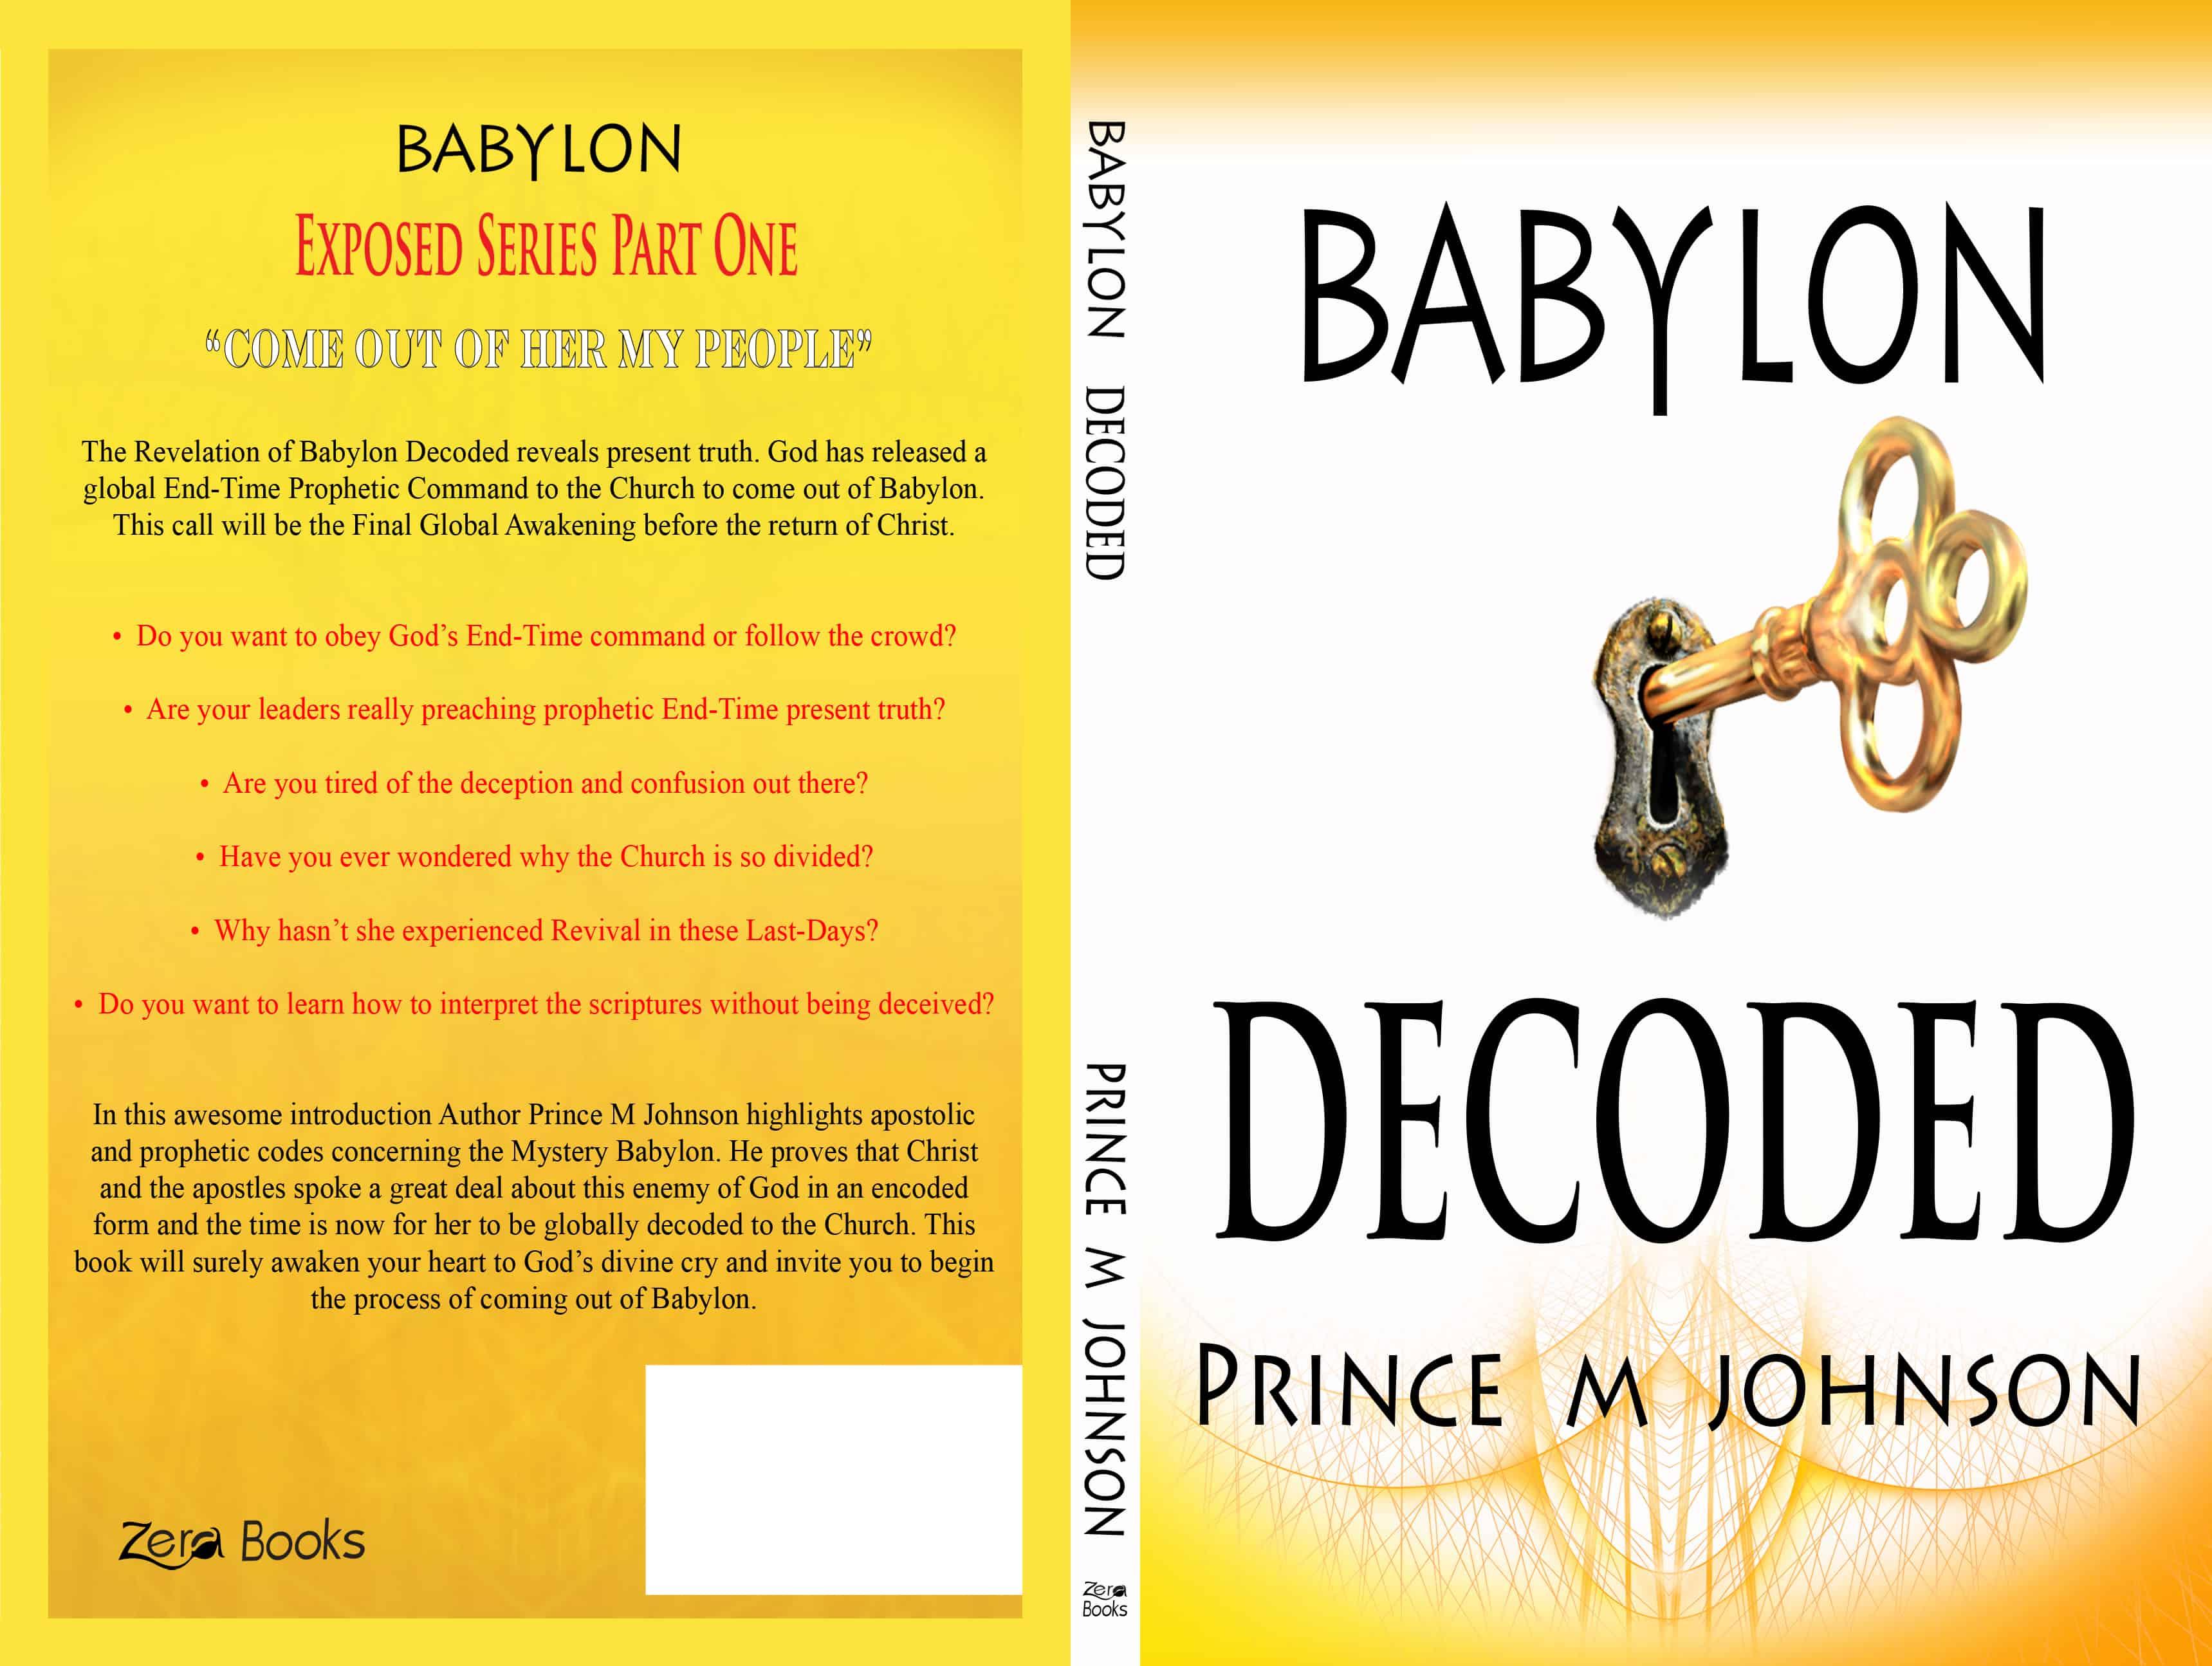 Babylon Exposed Series Babylon Decoded Book One